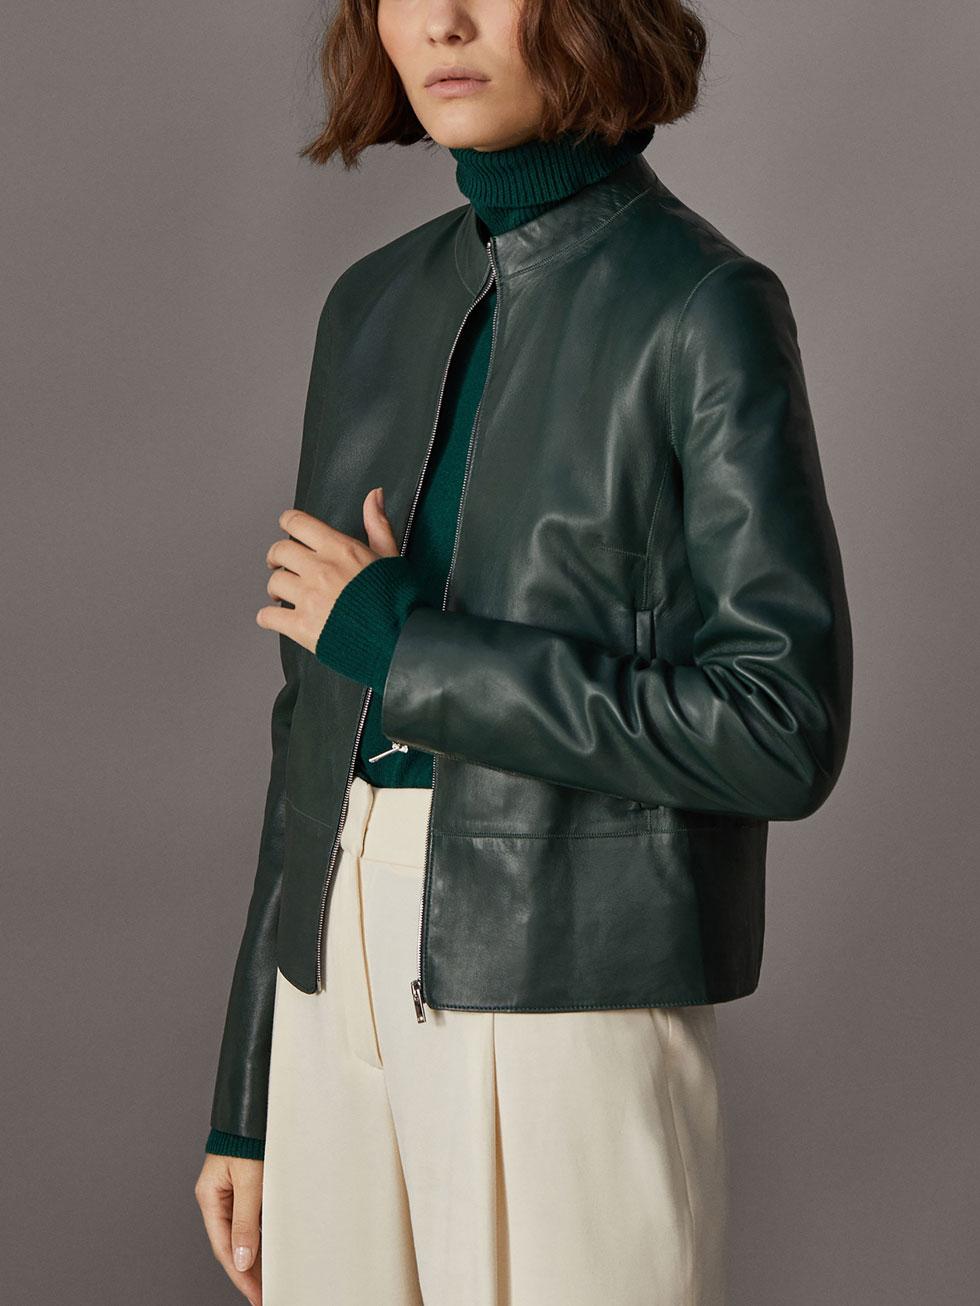 Coats & Jackets - WOMEN - Massimo Dutti